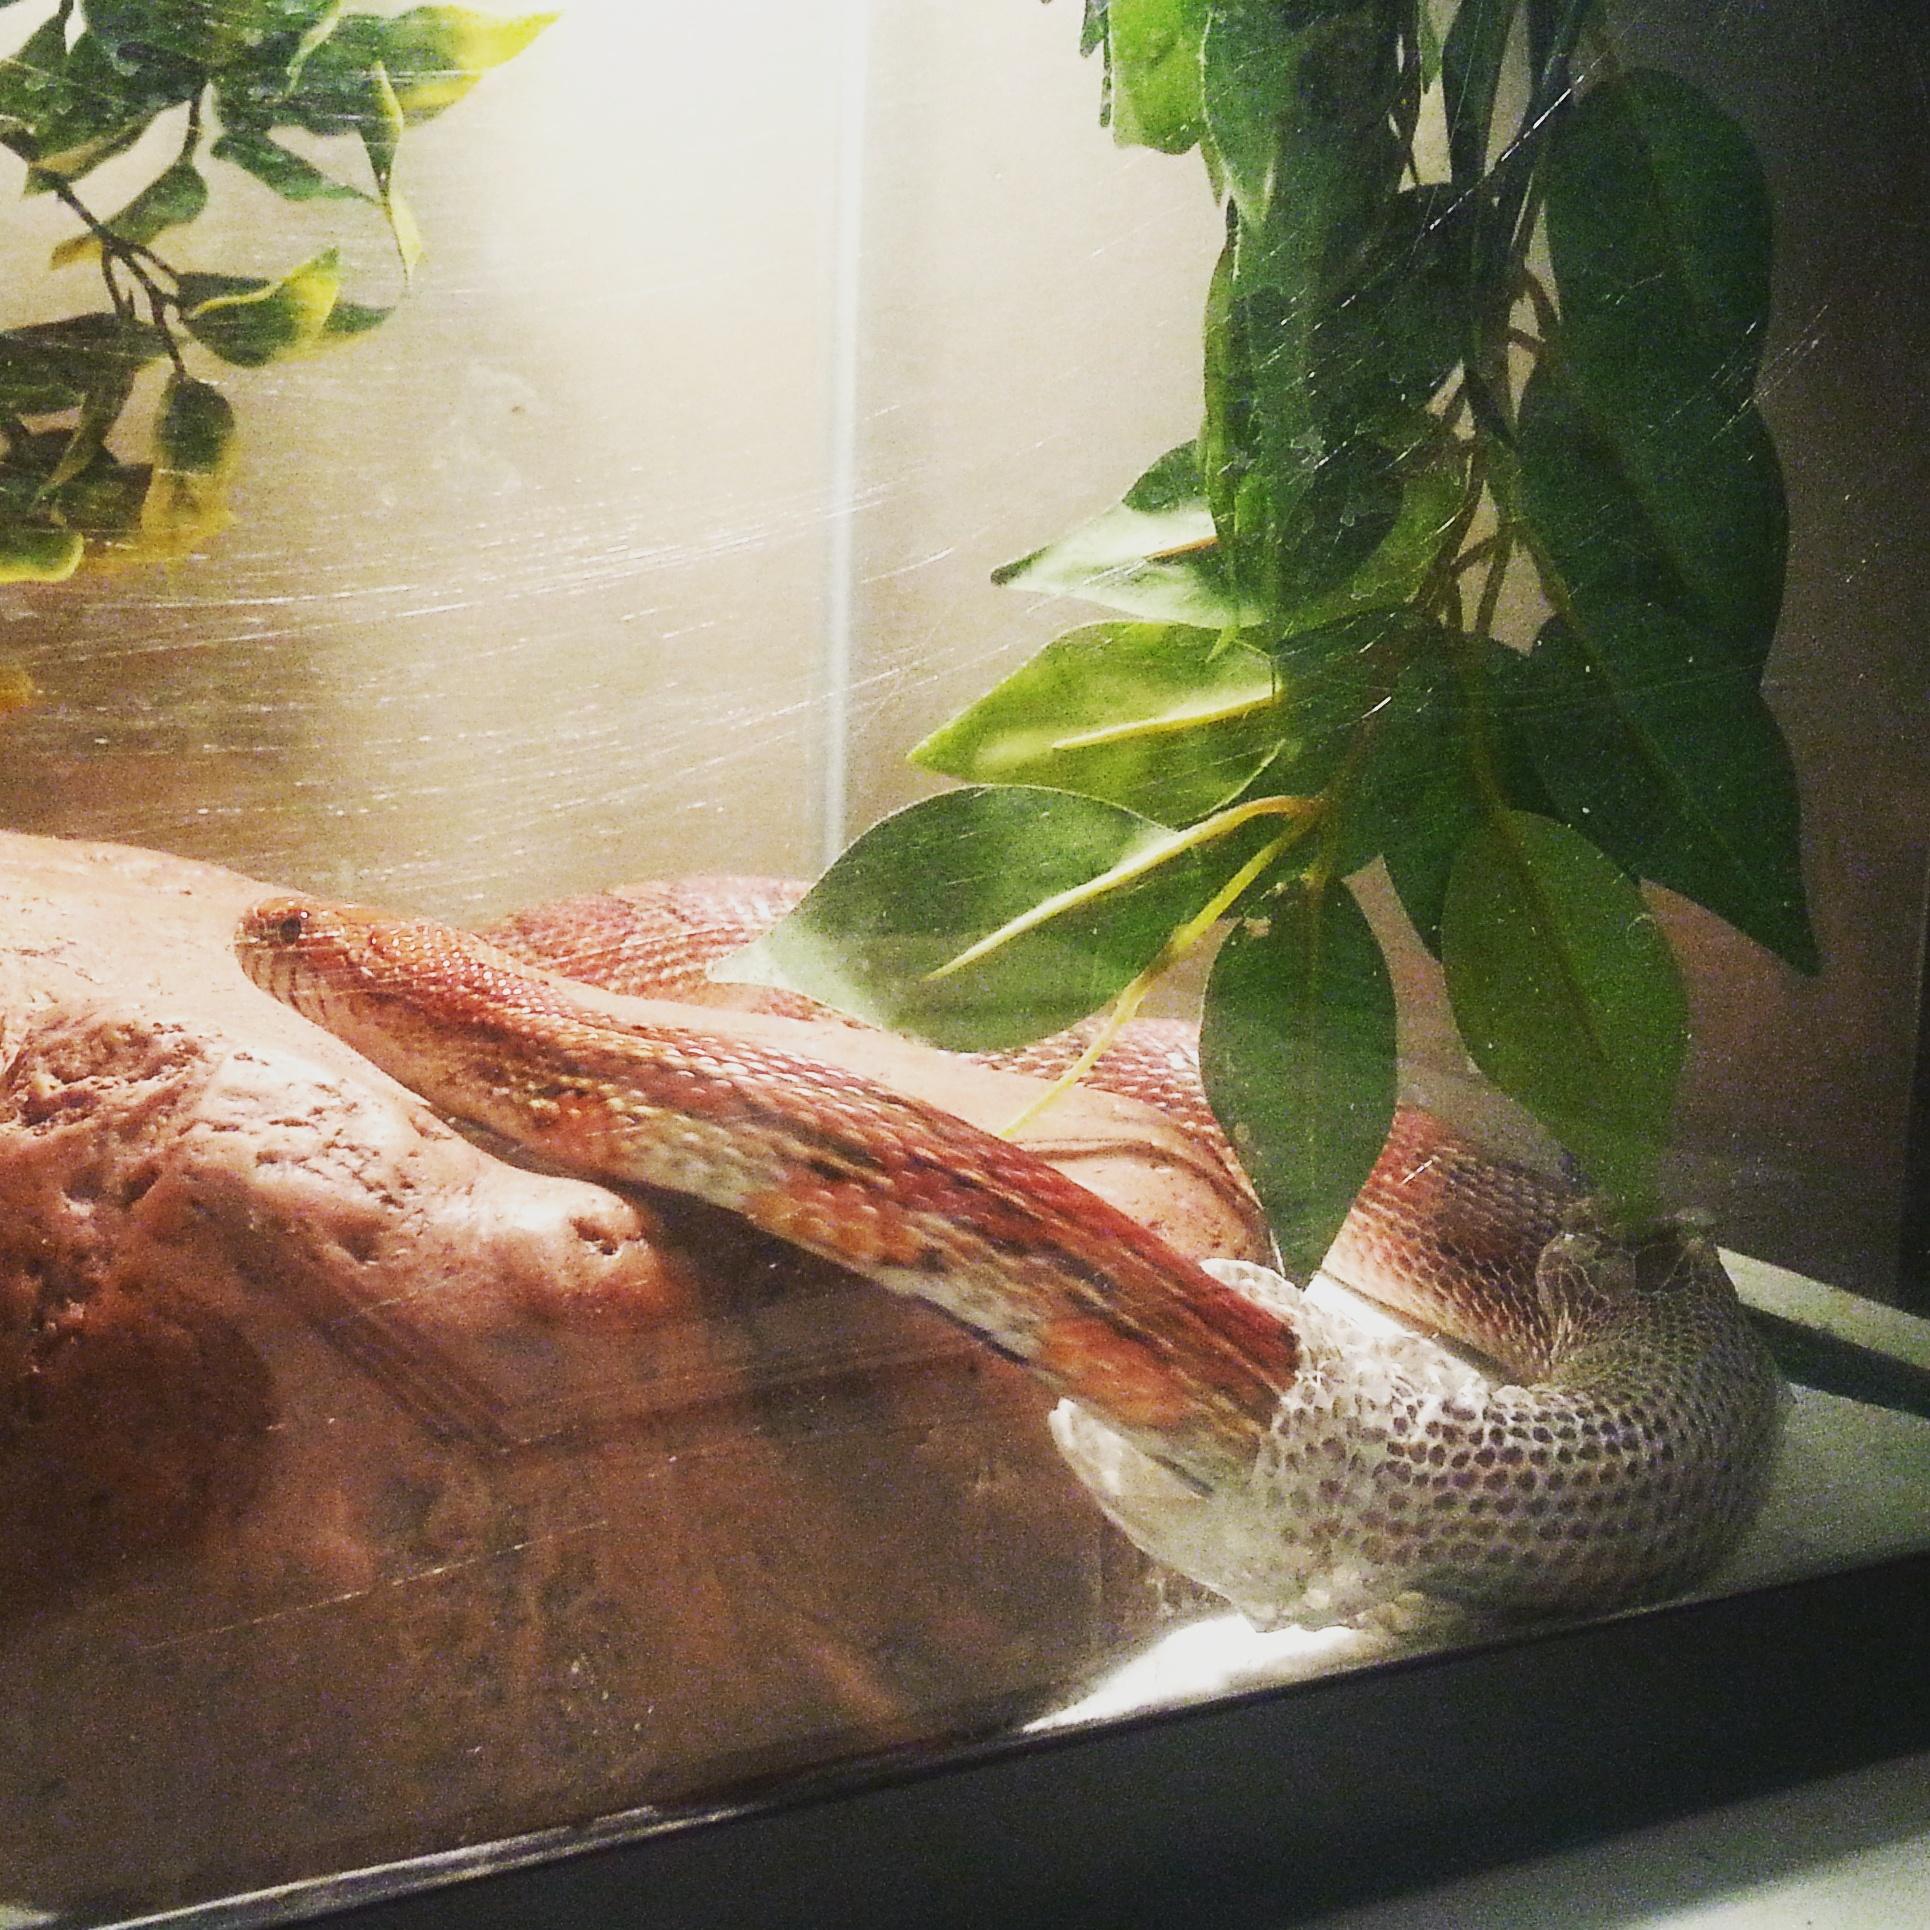 Nacho the Corn Snake